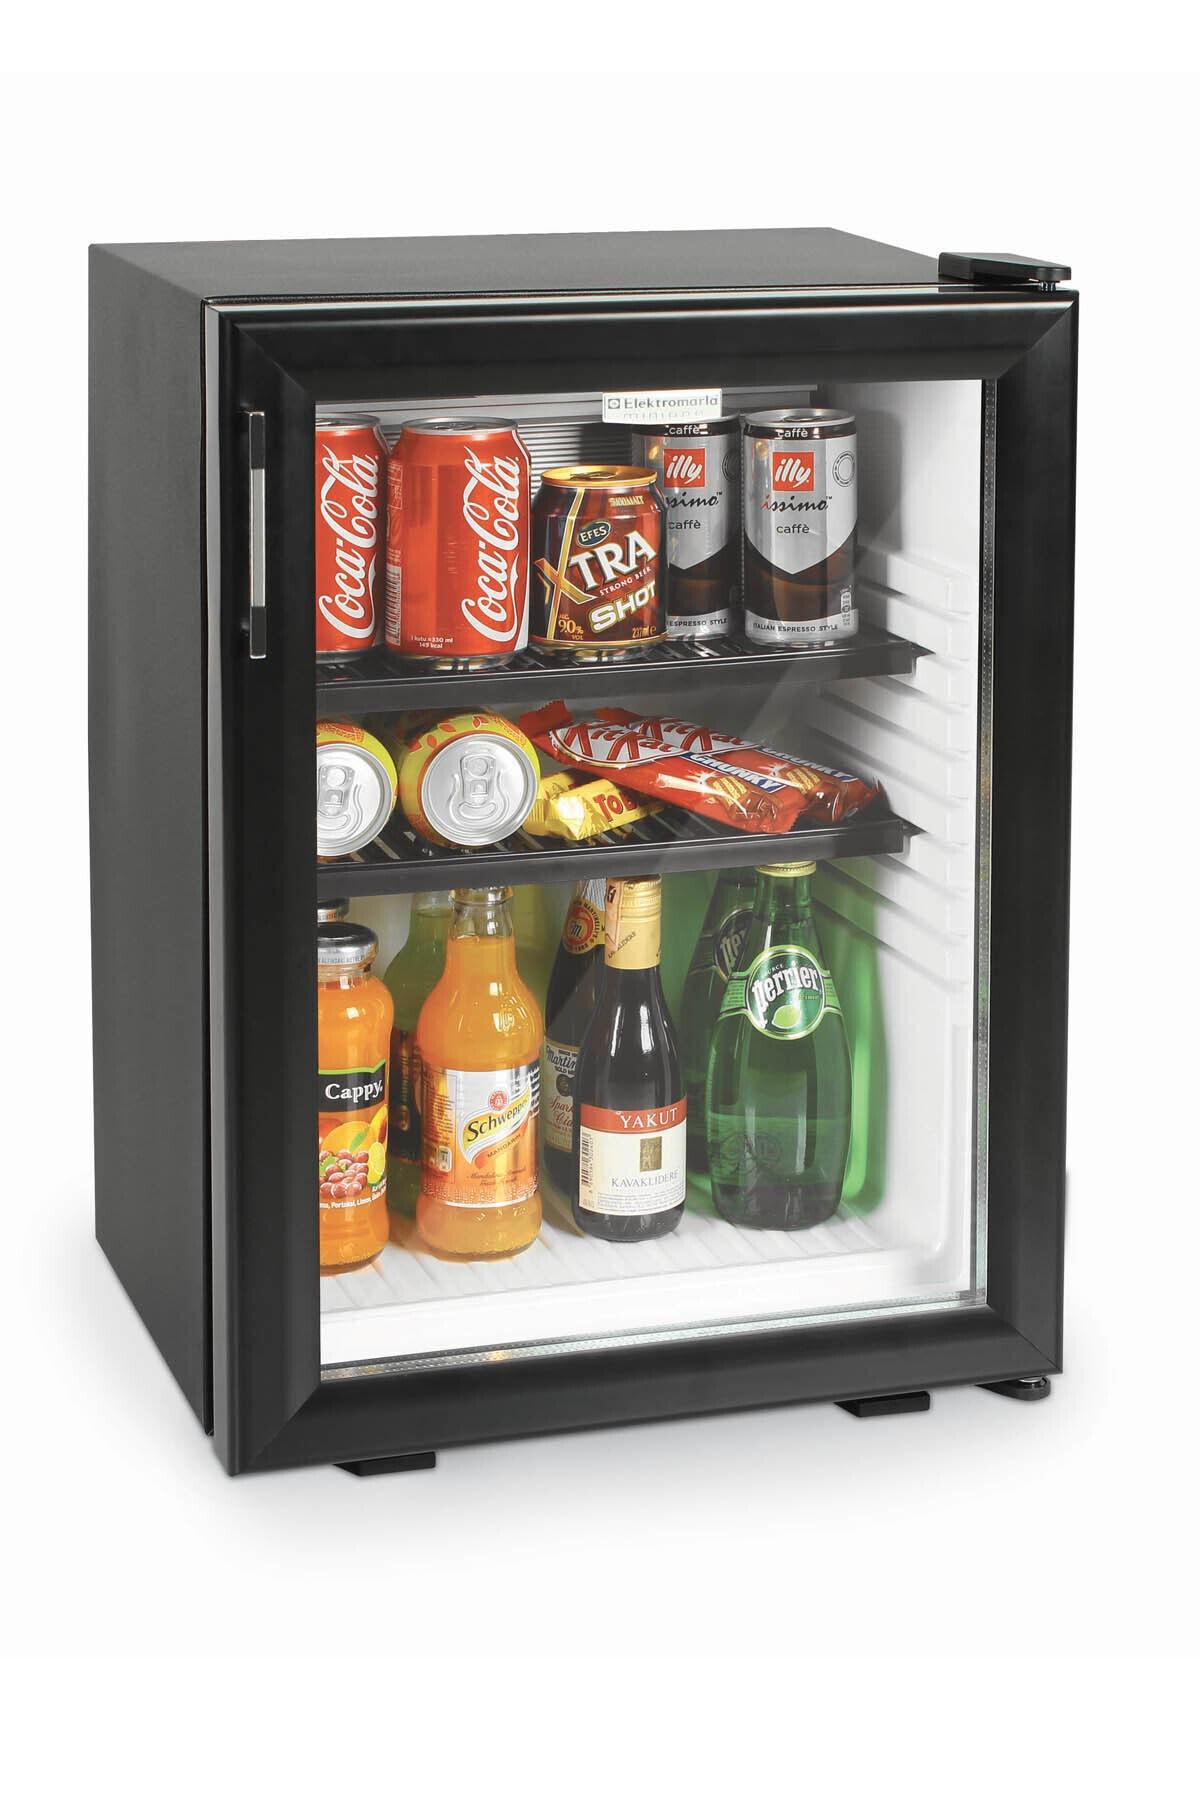 Elektromarla Siyah Cam Kapılı Minibar - Drc 35 lt 1